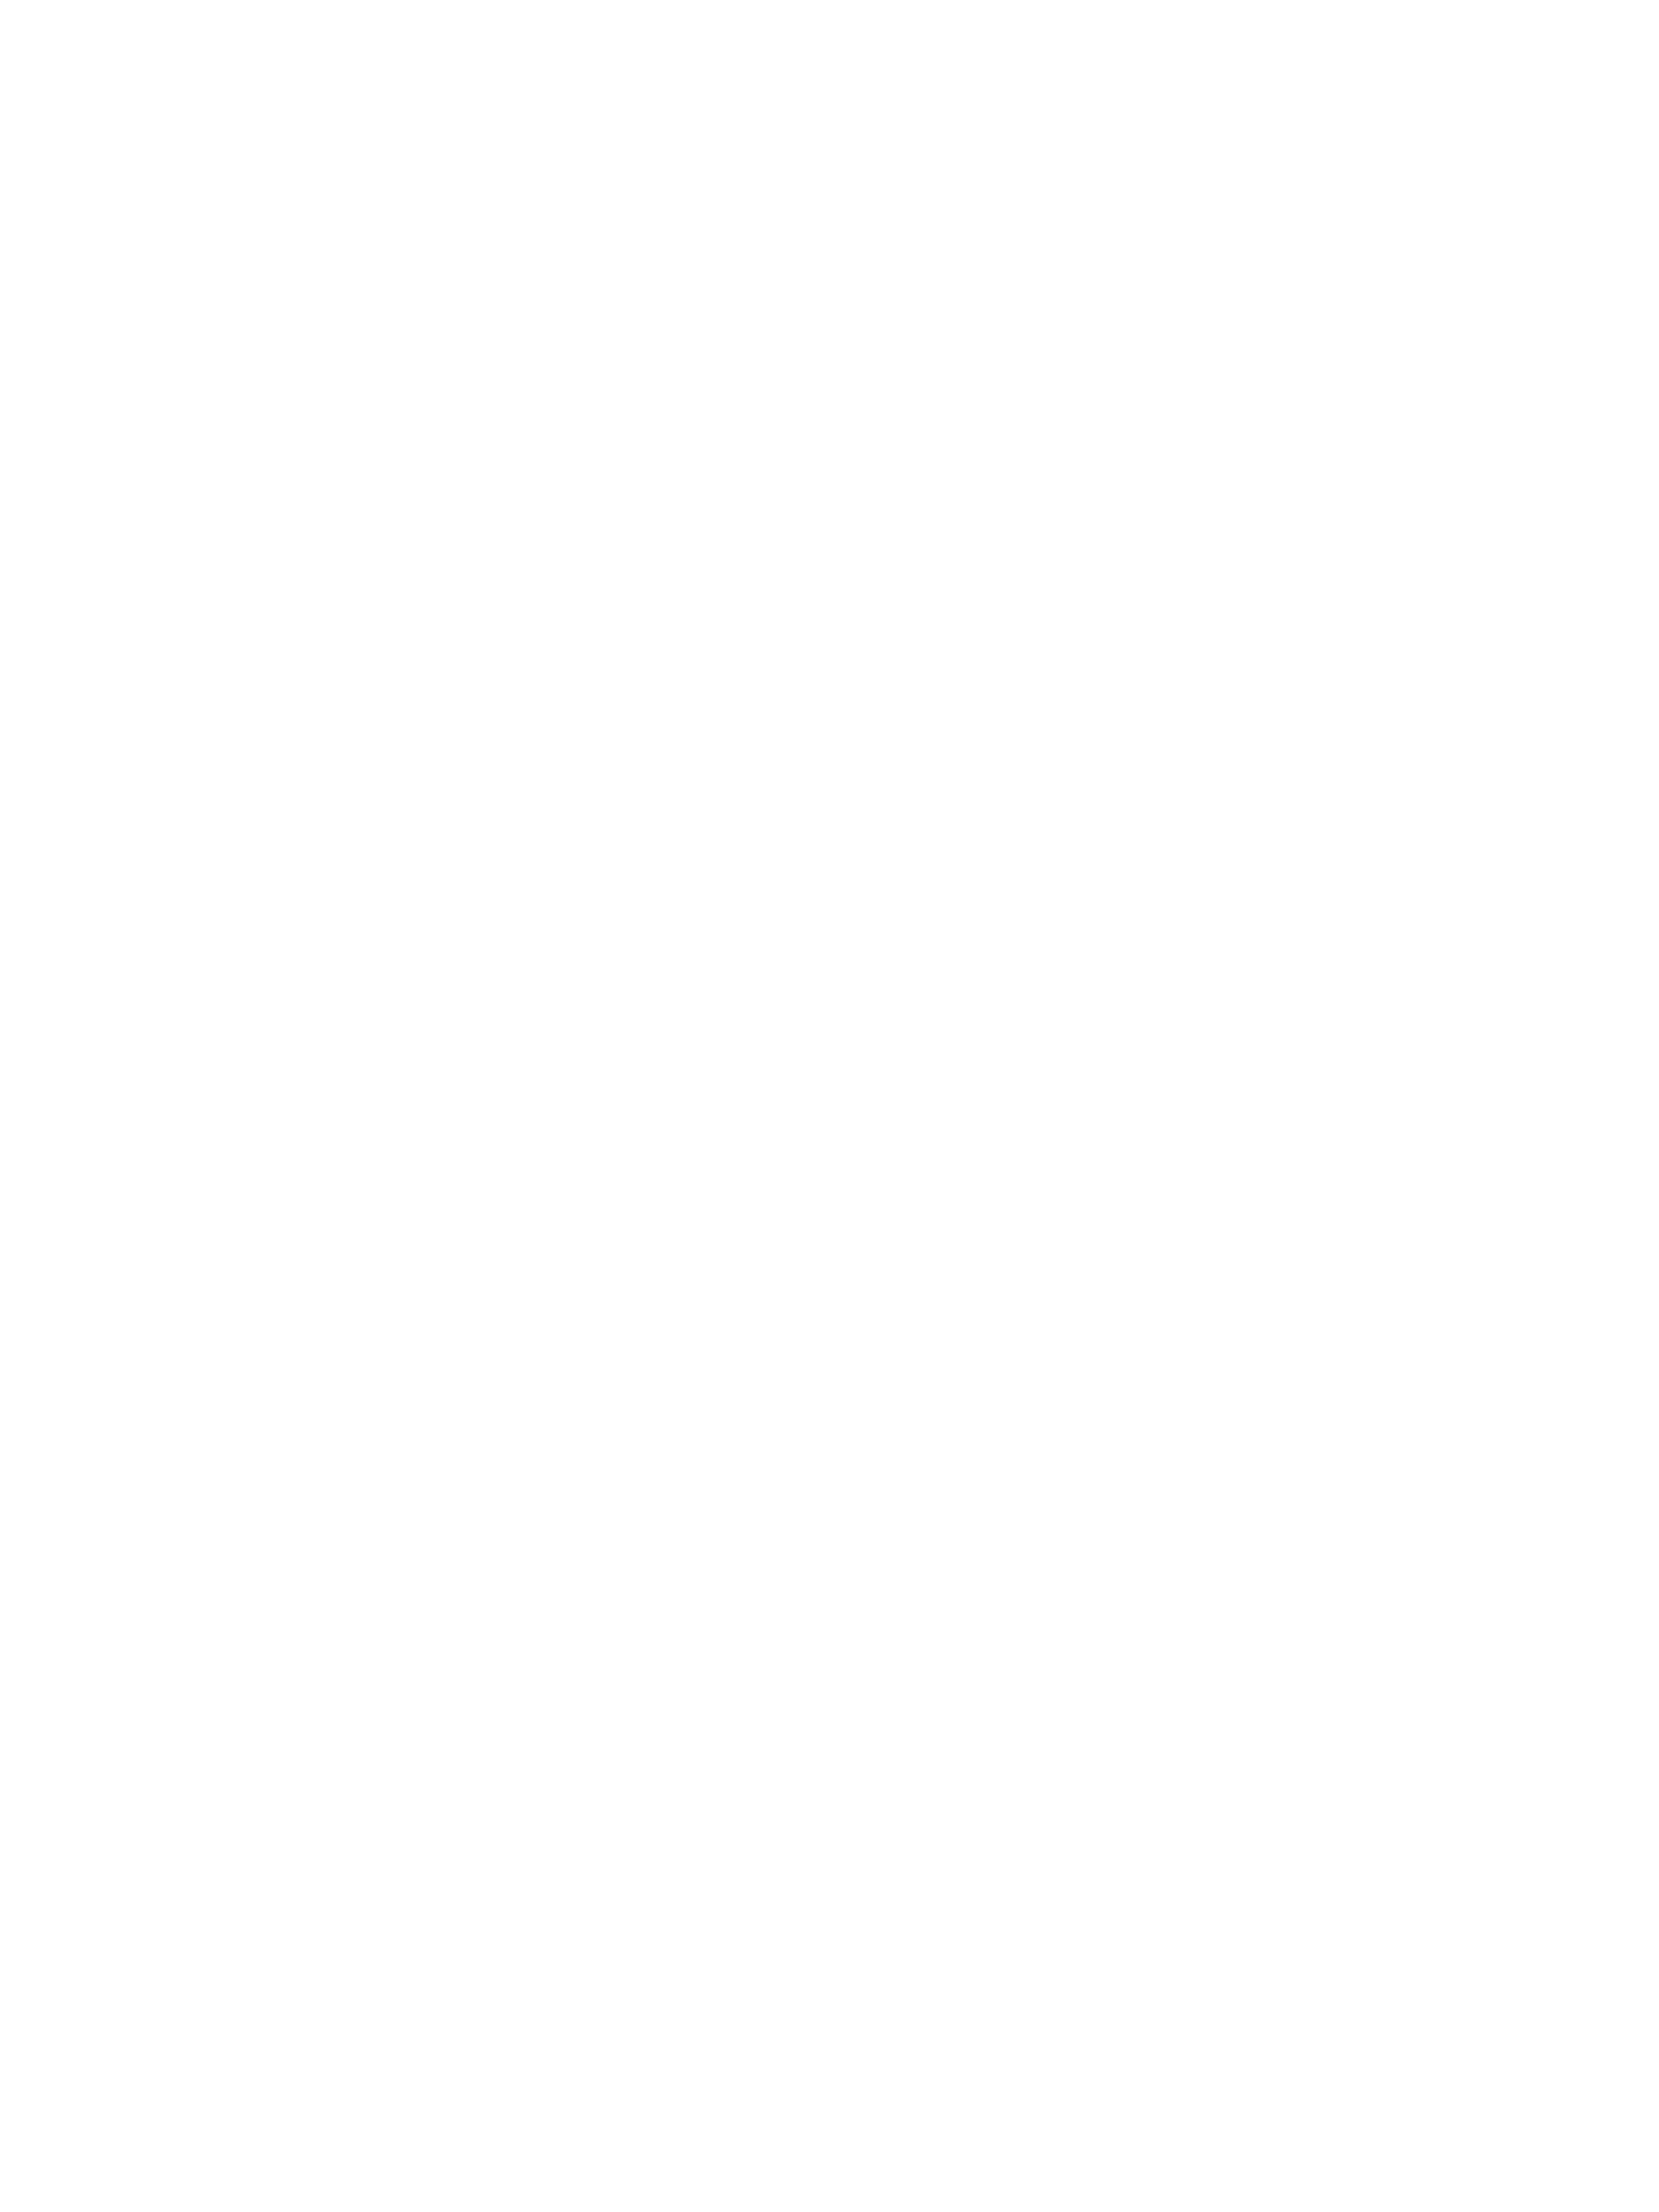 zheshishaa